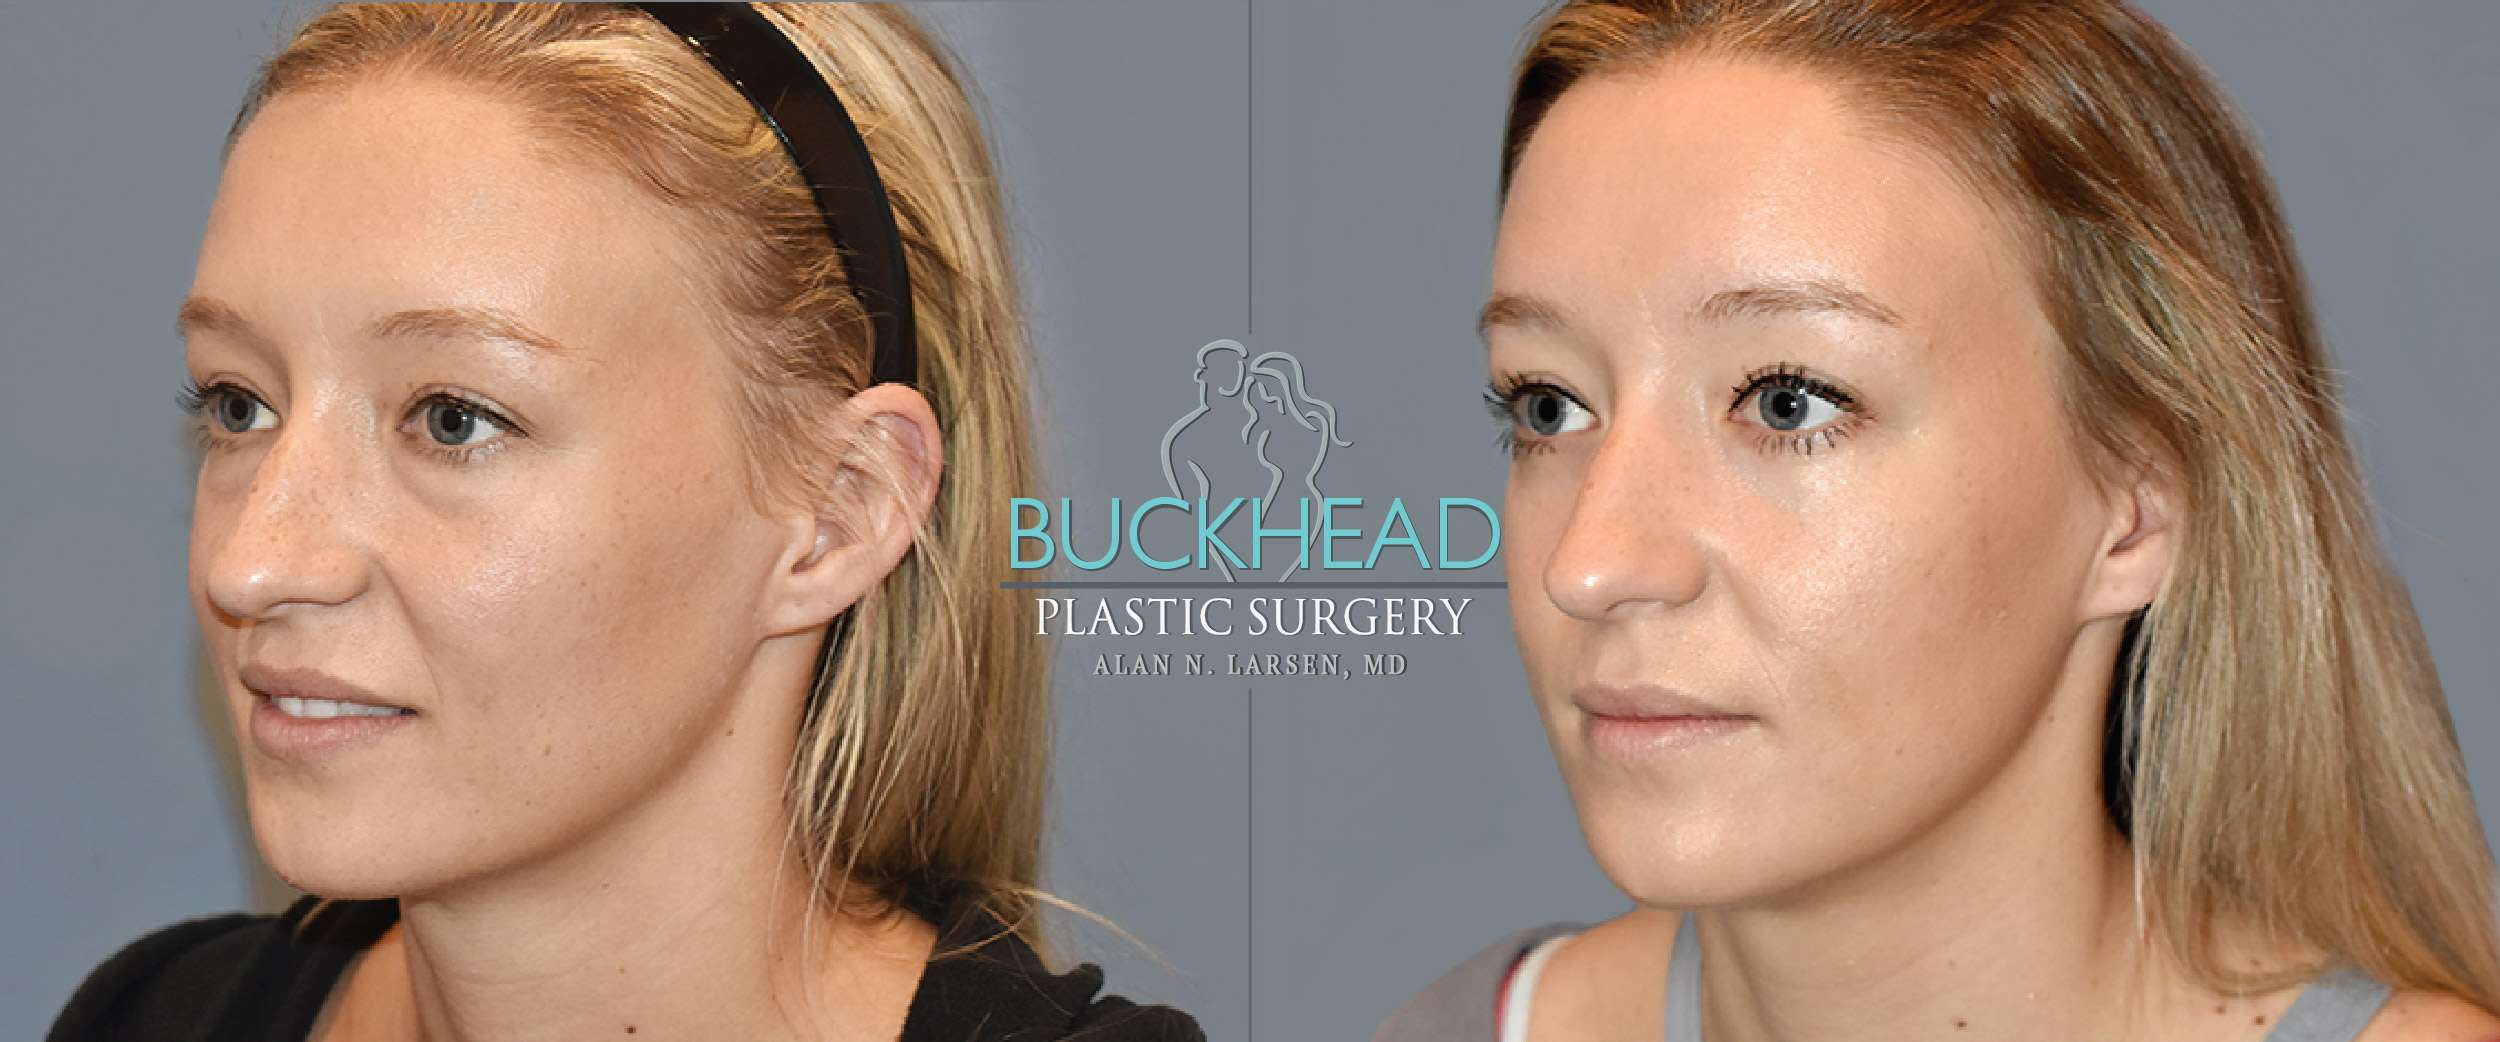 Before and After Photo Gallery   Blepharosty   Buckhead Plastic Surgery   Alan N. Larsen, MD   Board-Certified Plastic Surgeon   Atlanta GA